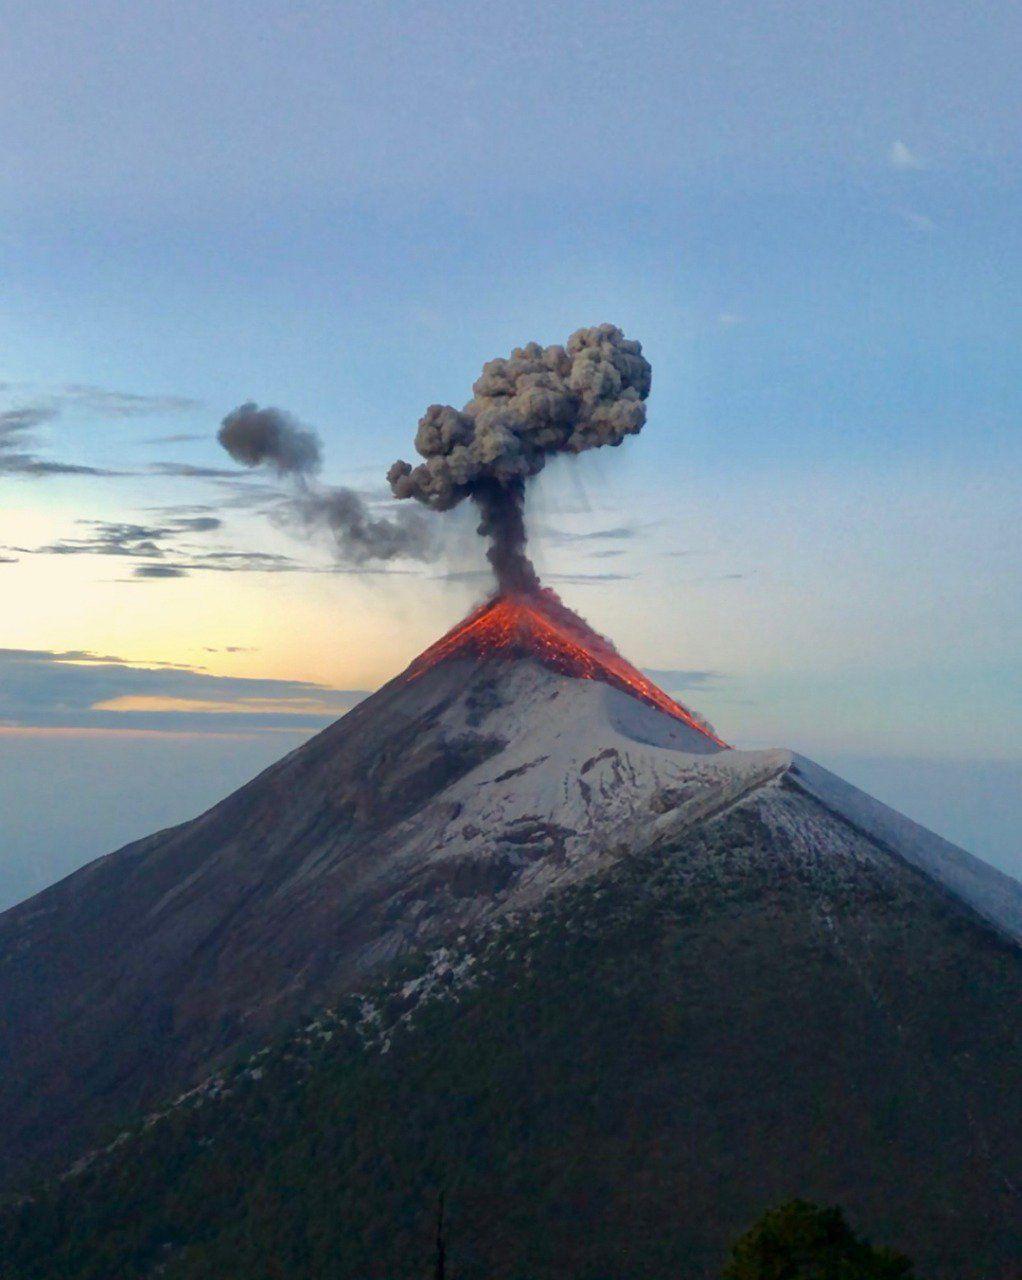 Fuego - activity of 23.11.2017, view of snowy background from the acatenango - photo Fabian via Clima Guatemala